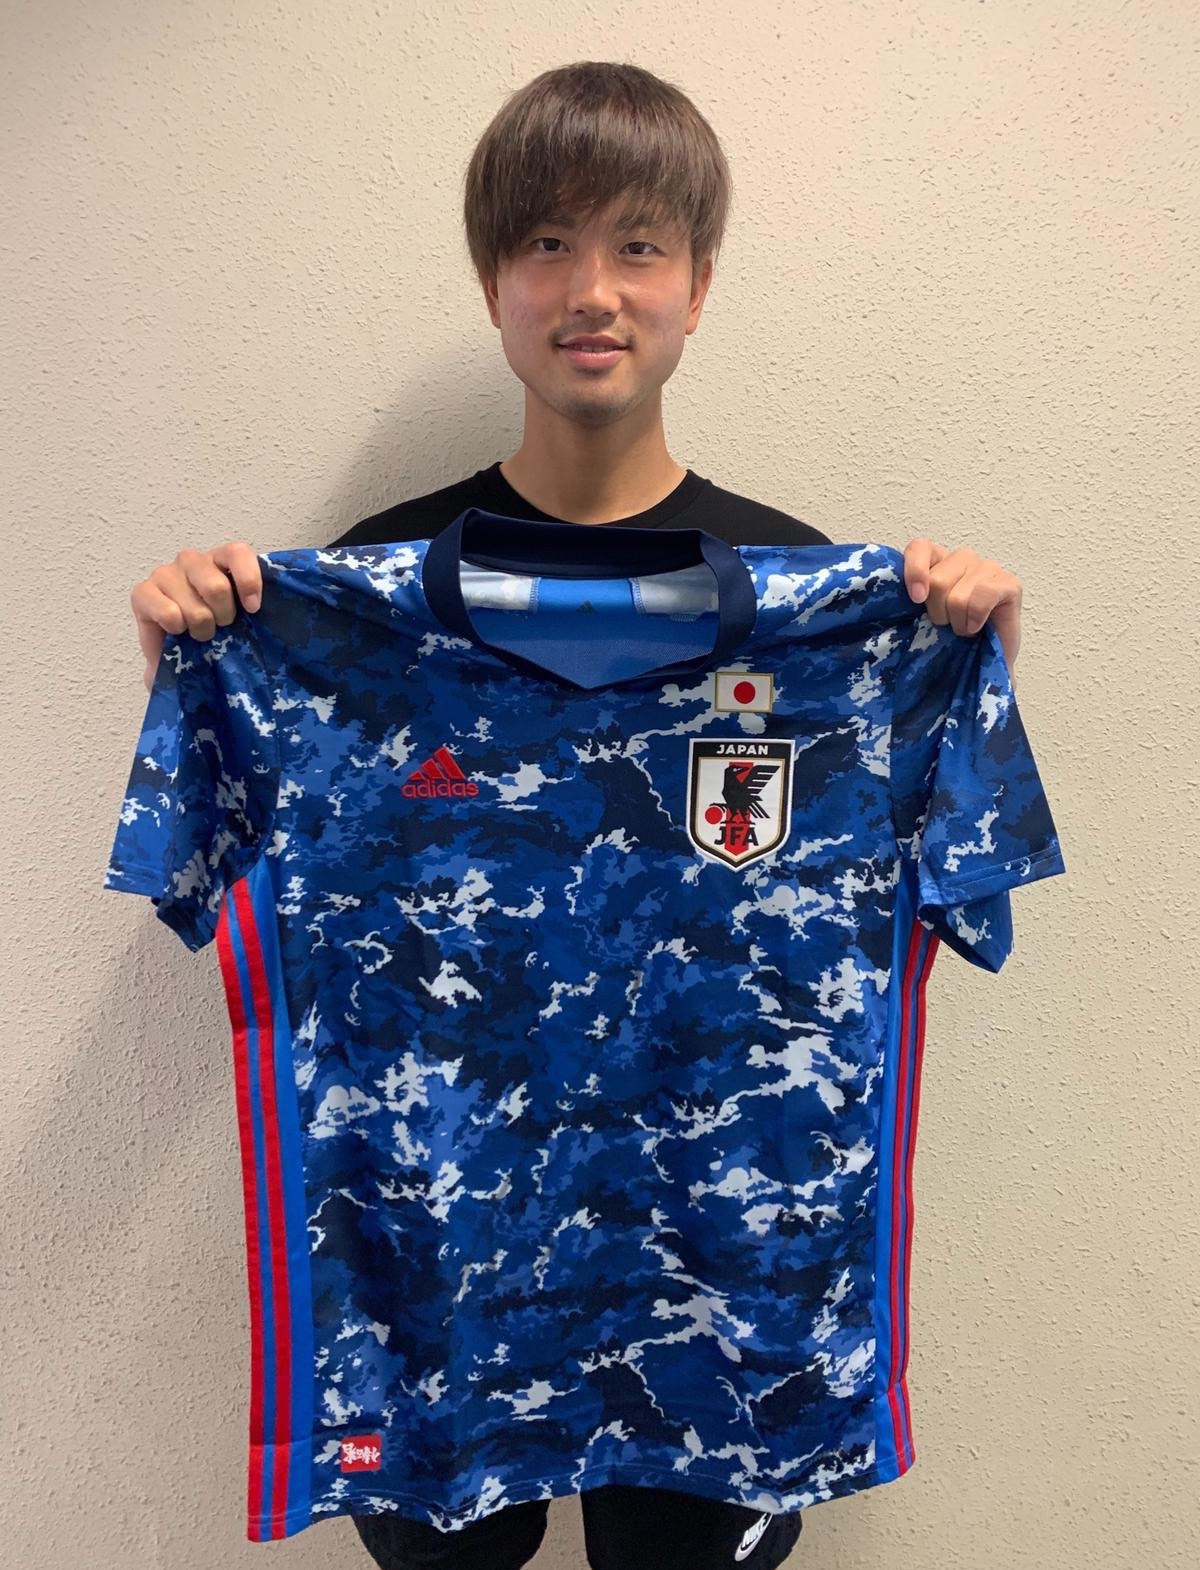 【直筆サイン入り公式】U-23日本代表 宮崎 幾笑 選手(FC東京)